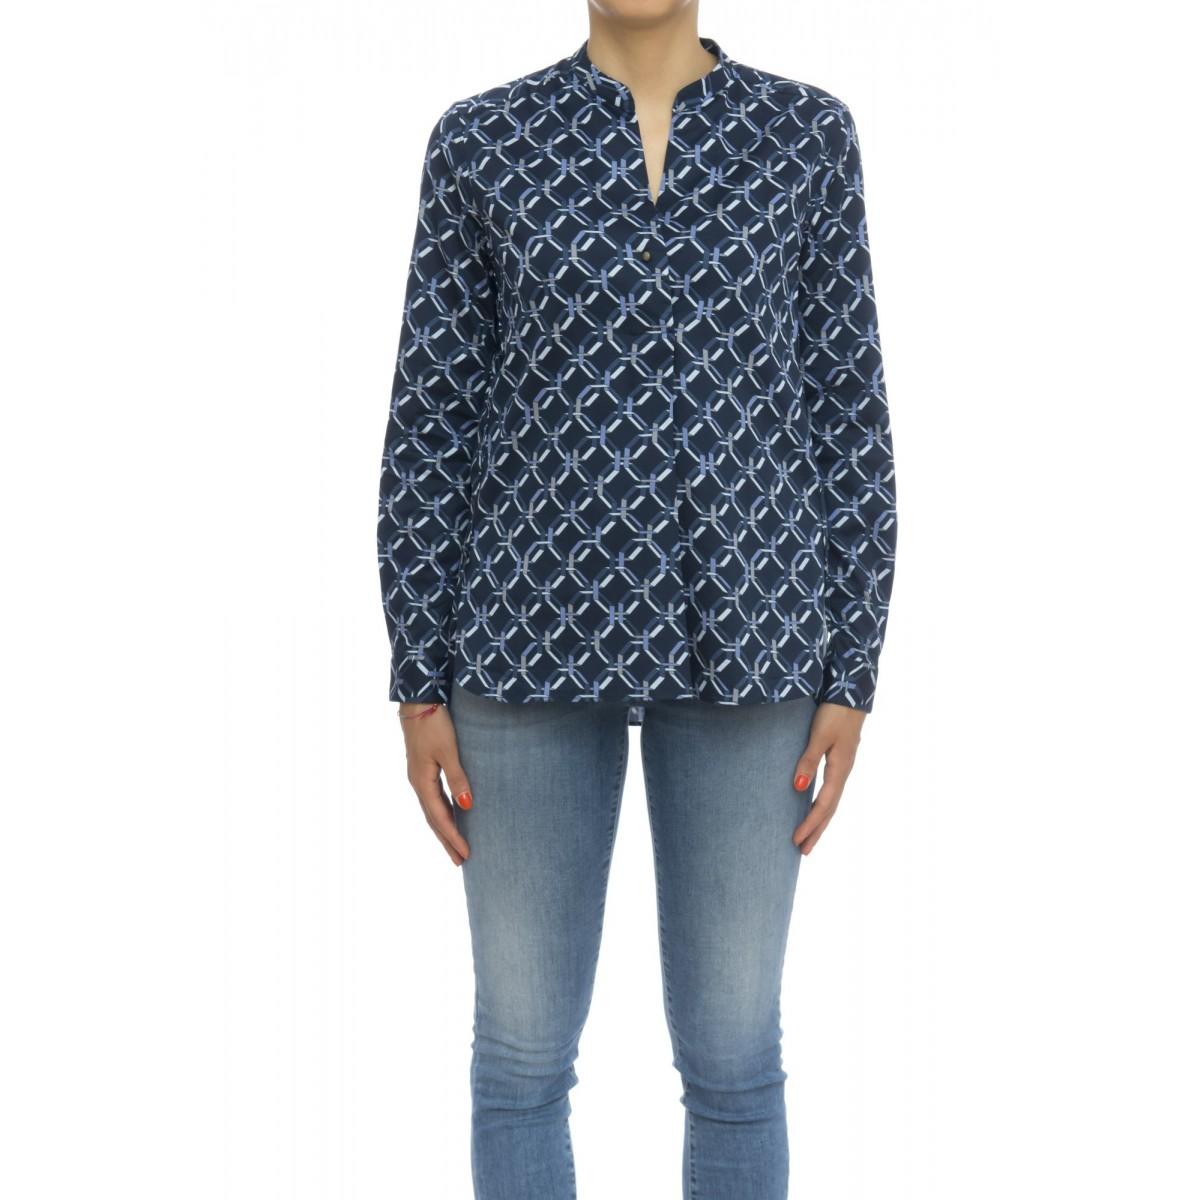 Camicia donna - Rxf znn